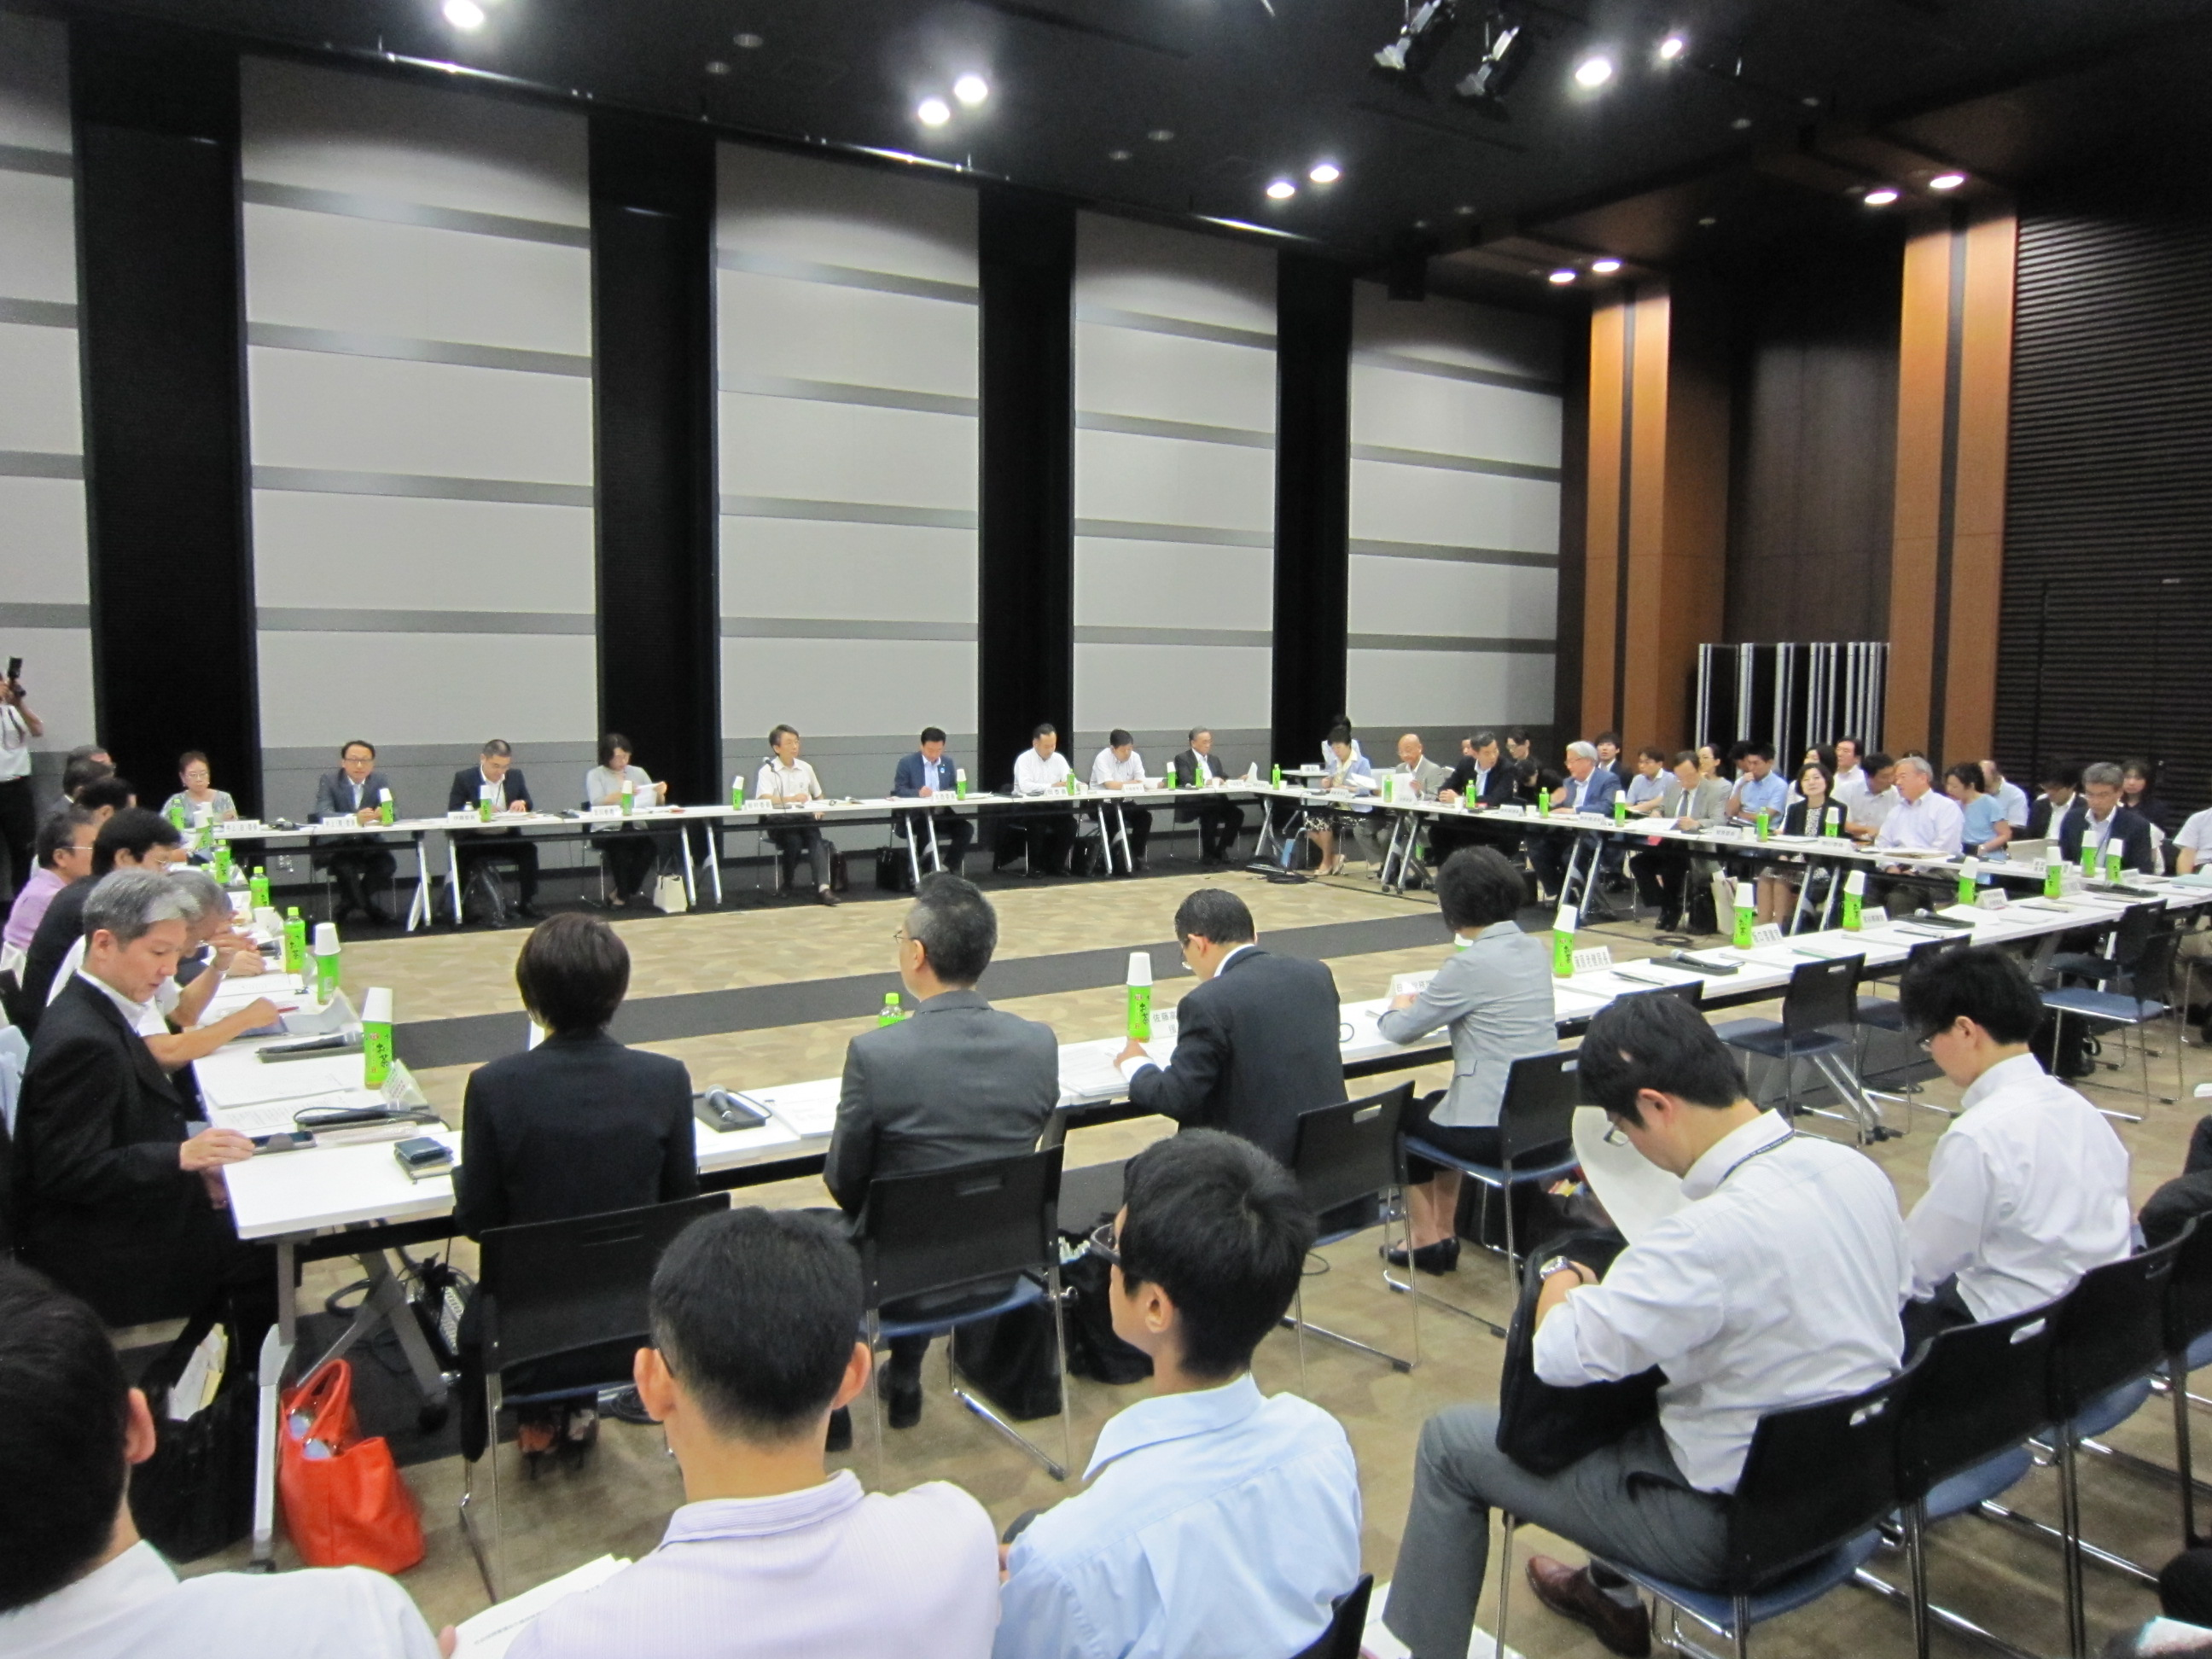 7月20日に開催された、「第60回 社会保障審議会 介護保険部会」